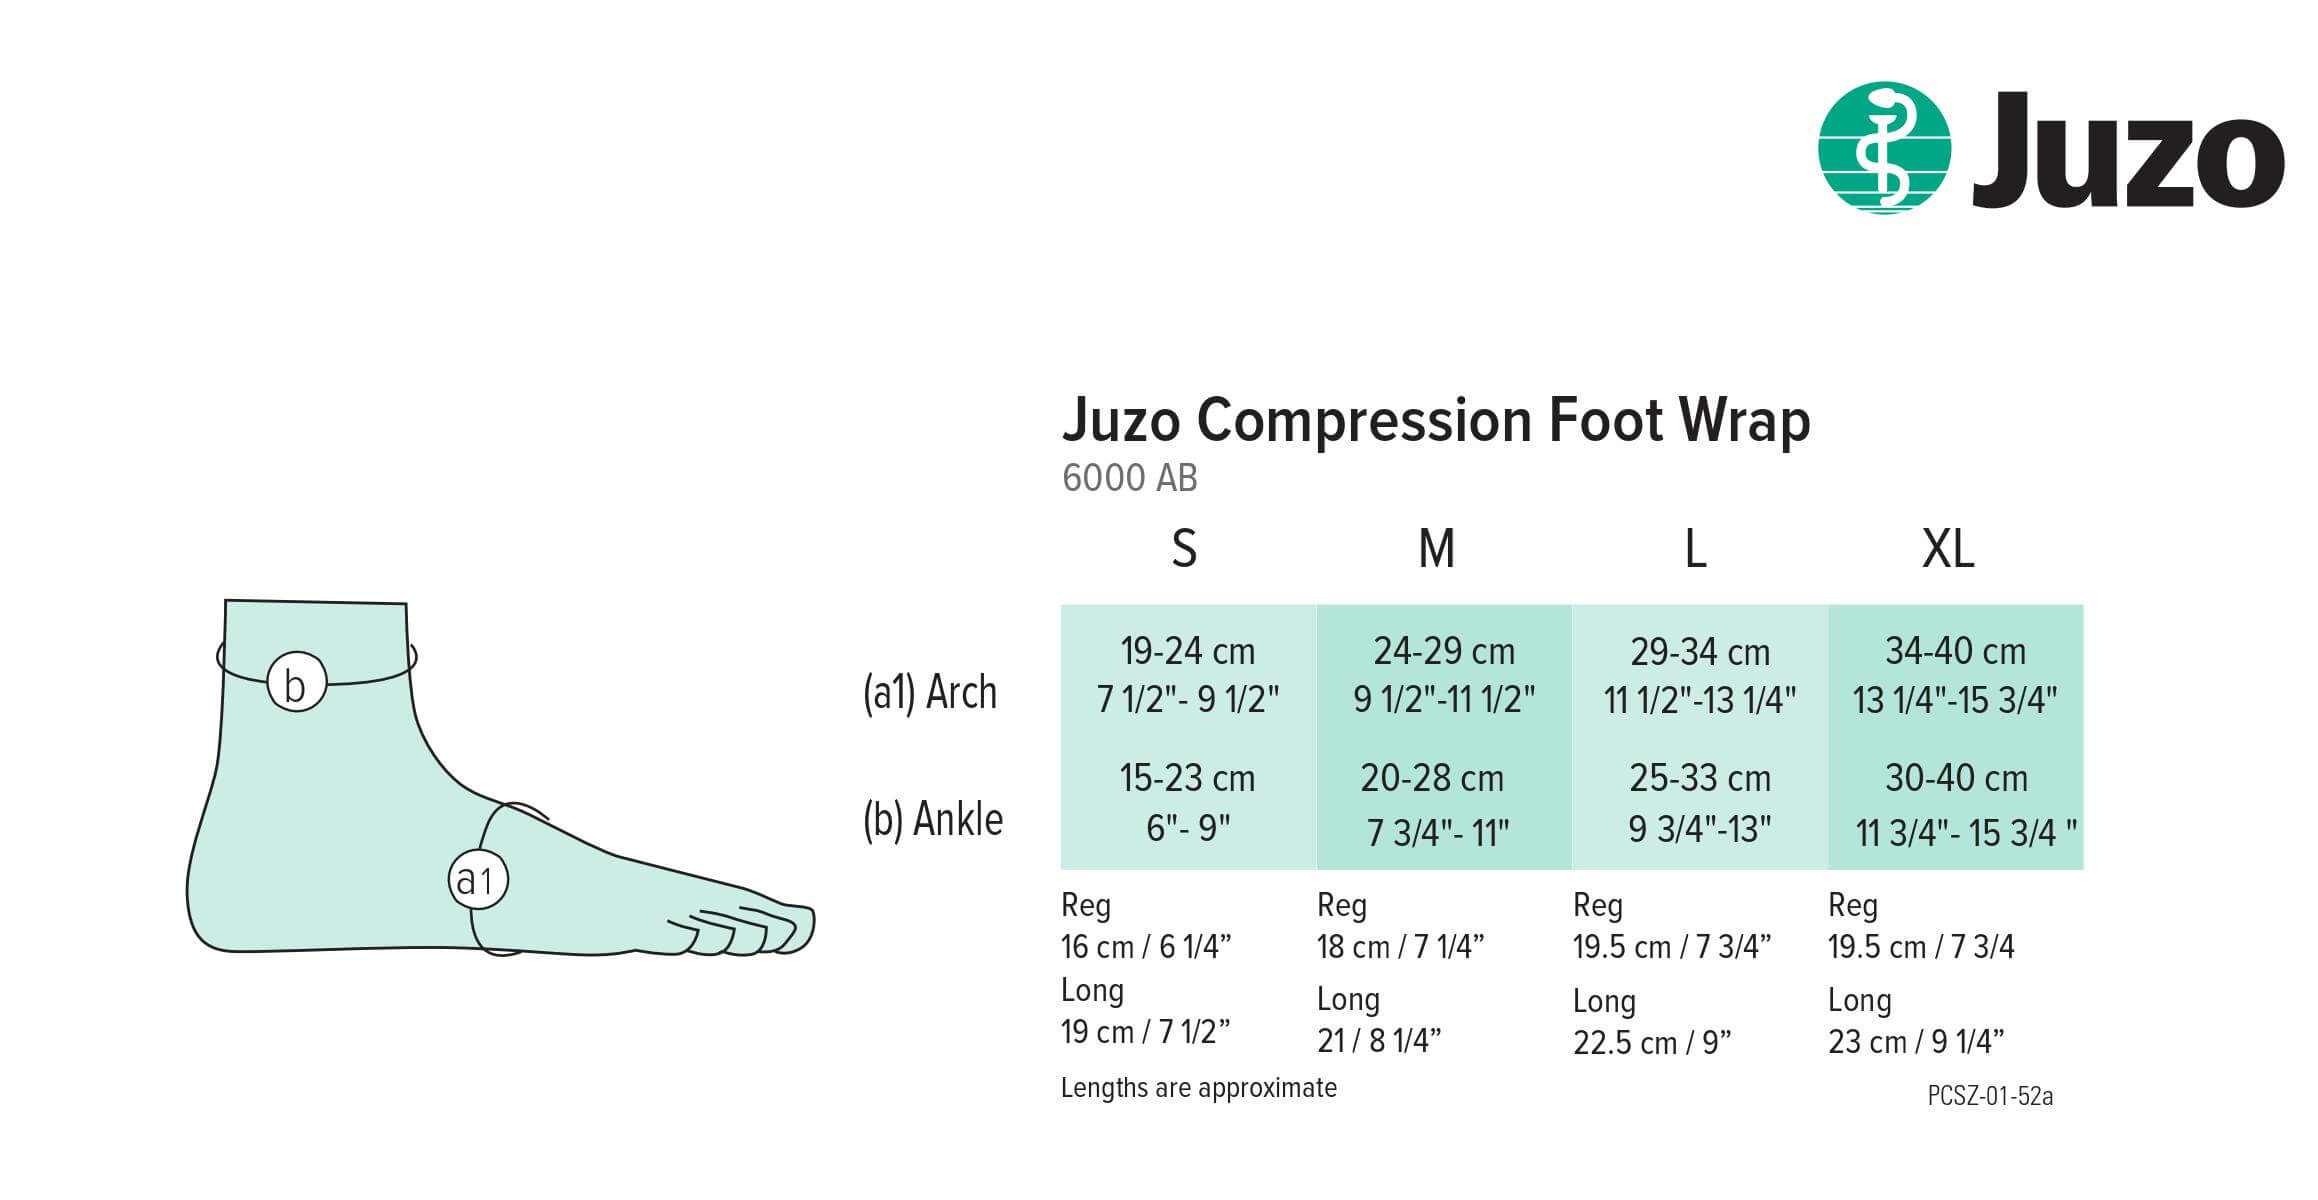 juzo-foot-wrap-sizing-chart-2.jpg